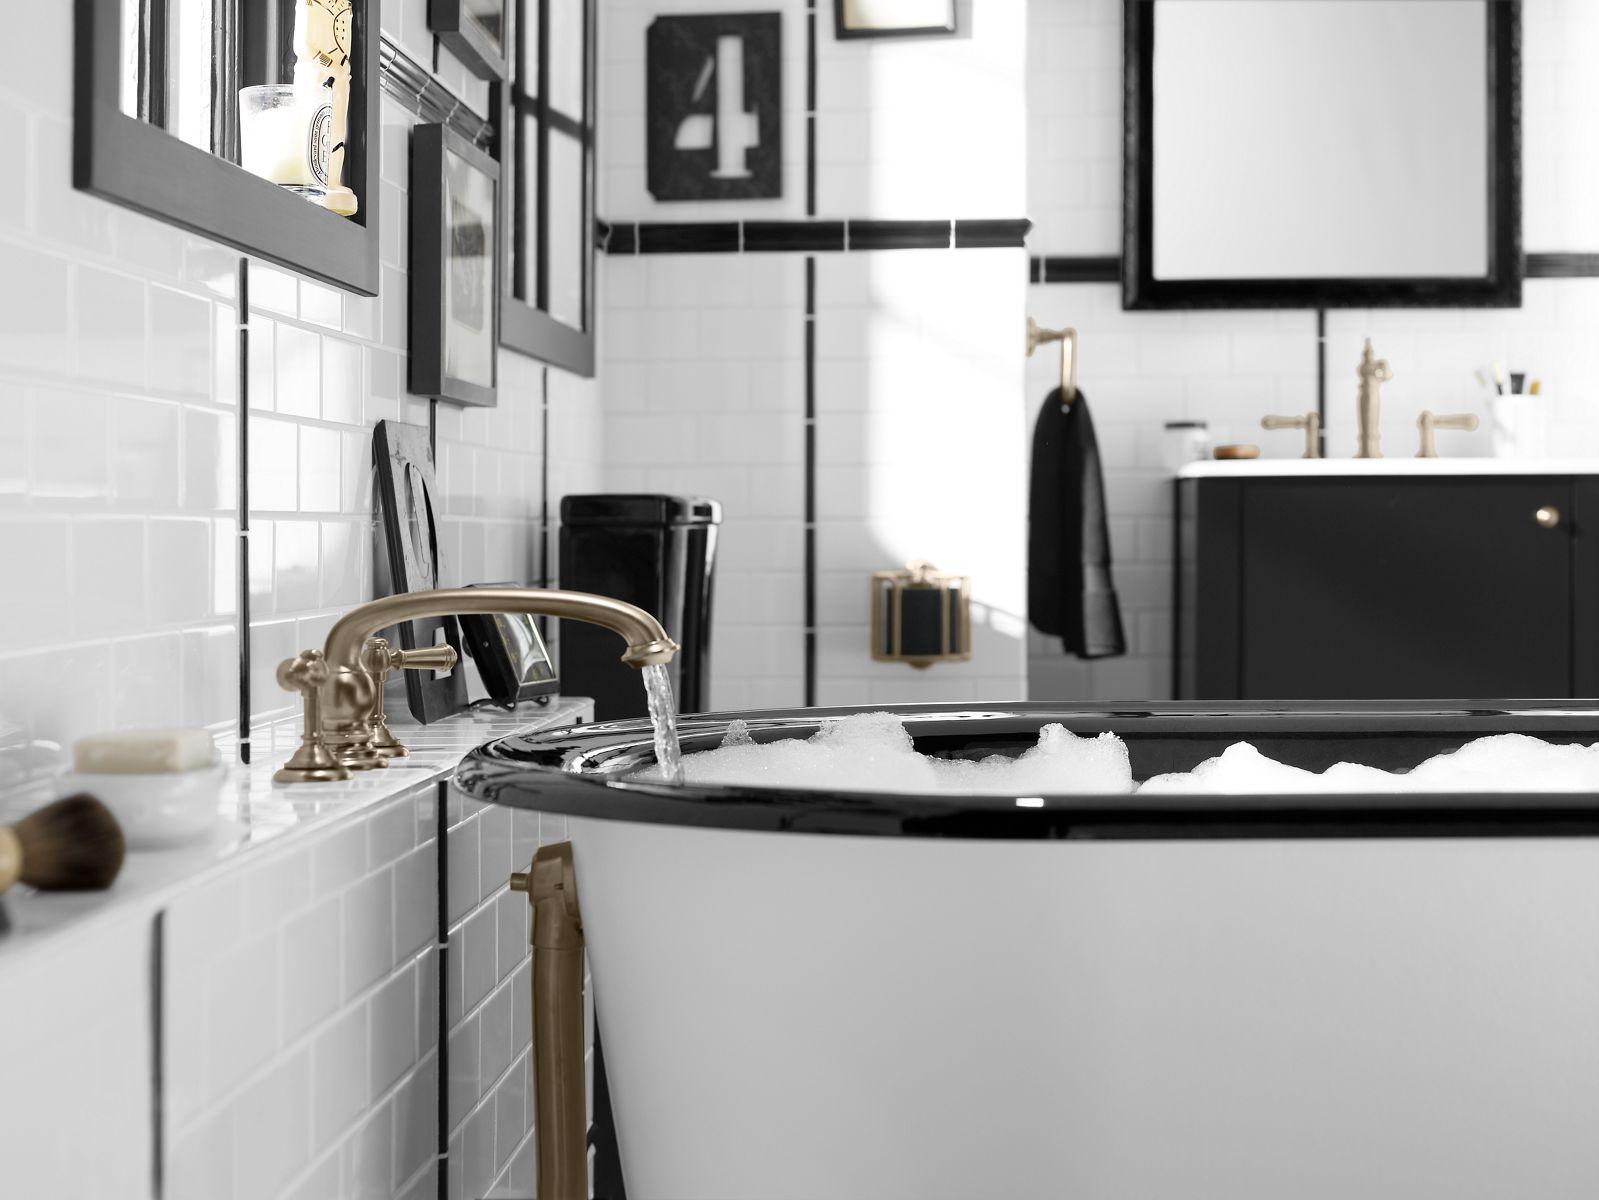 installation bathtub faucets guide